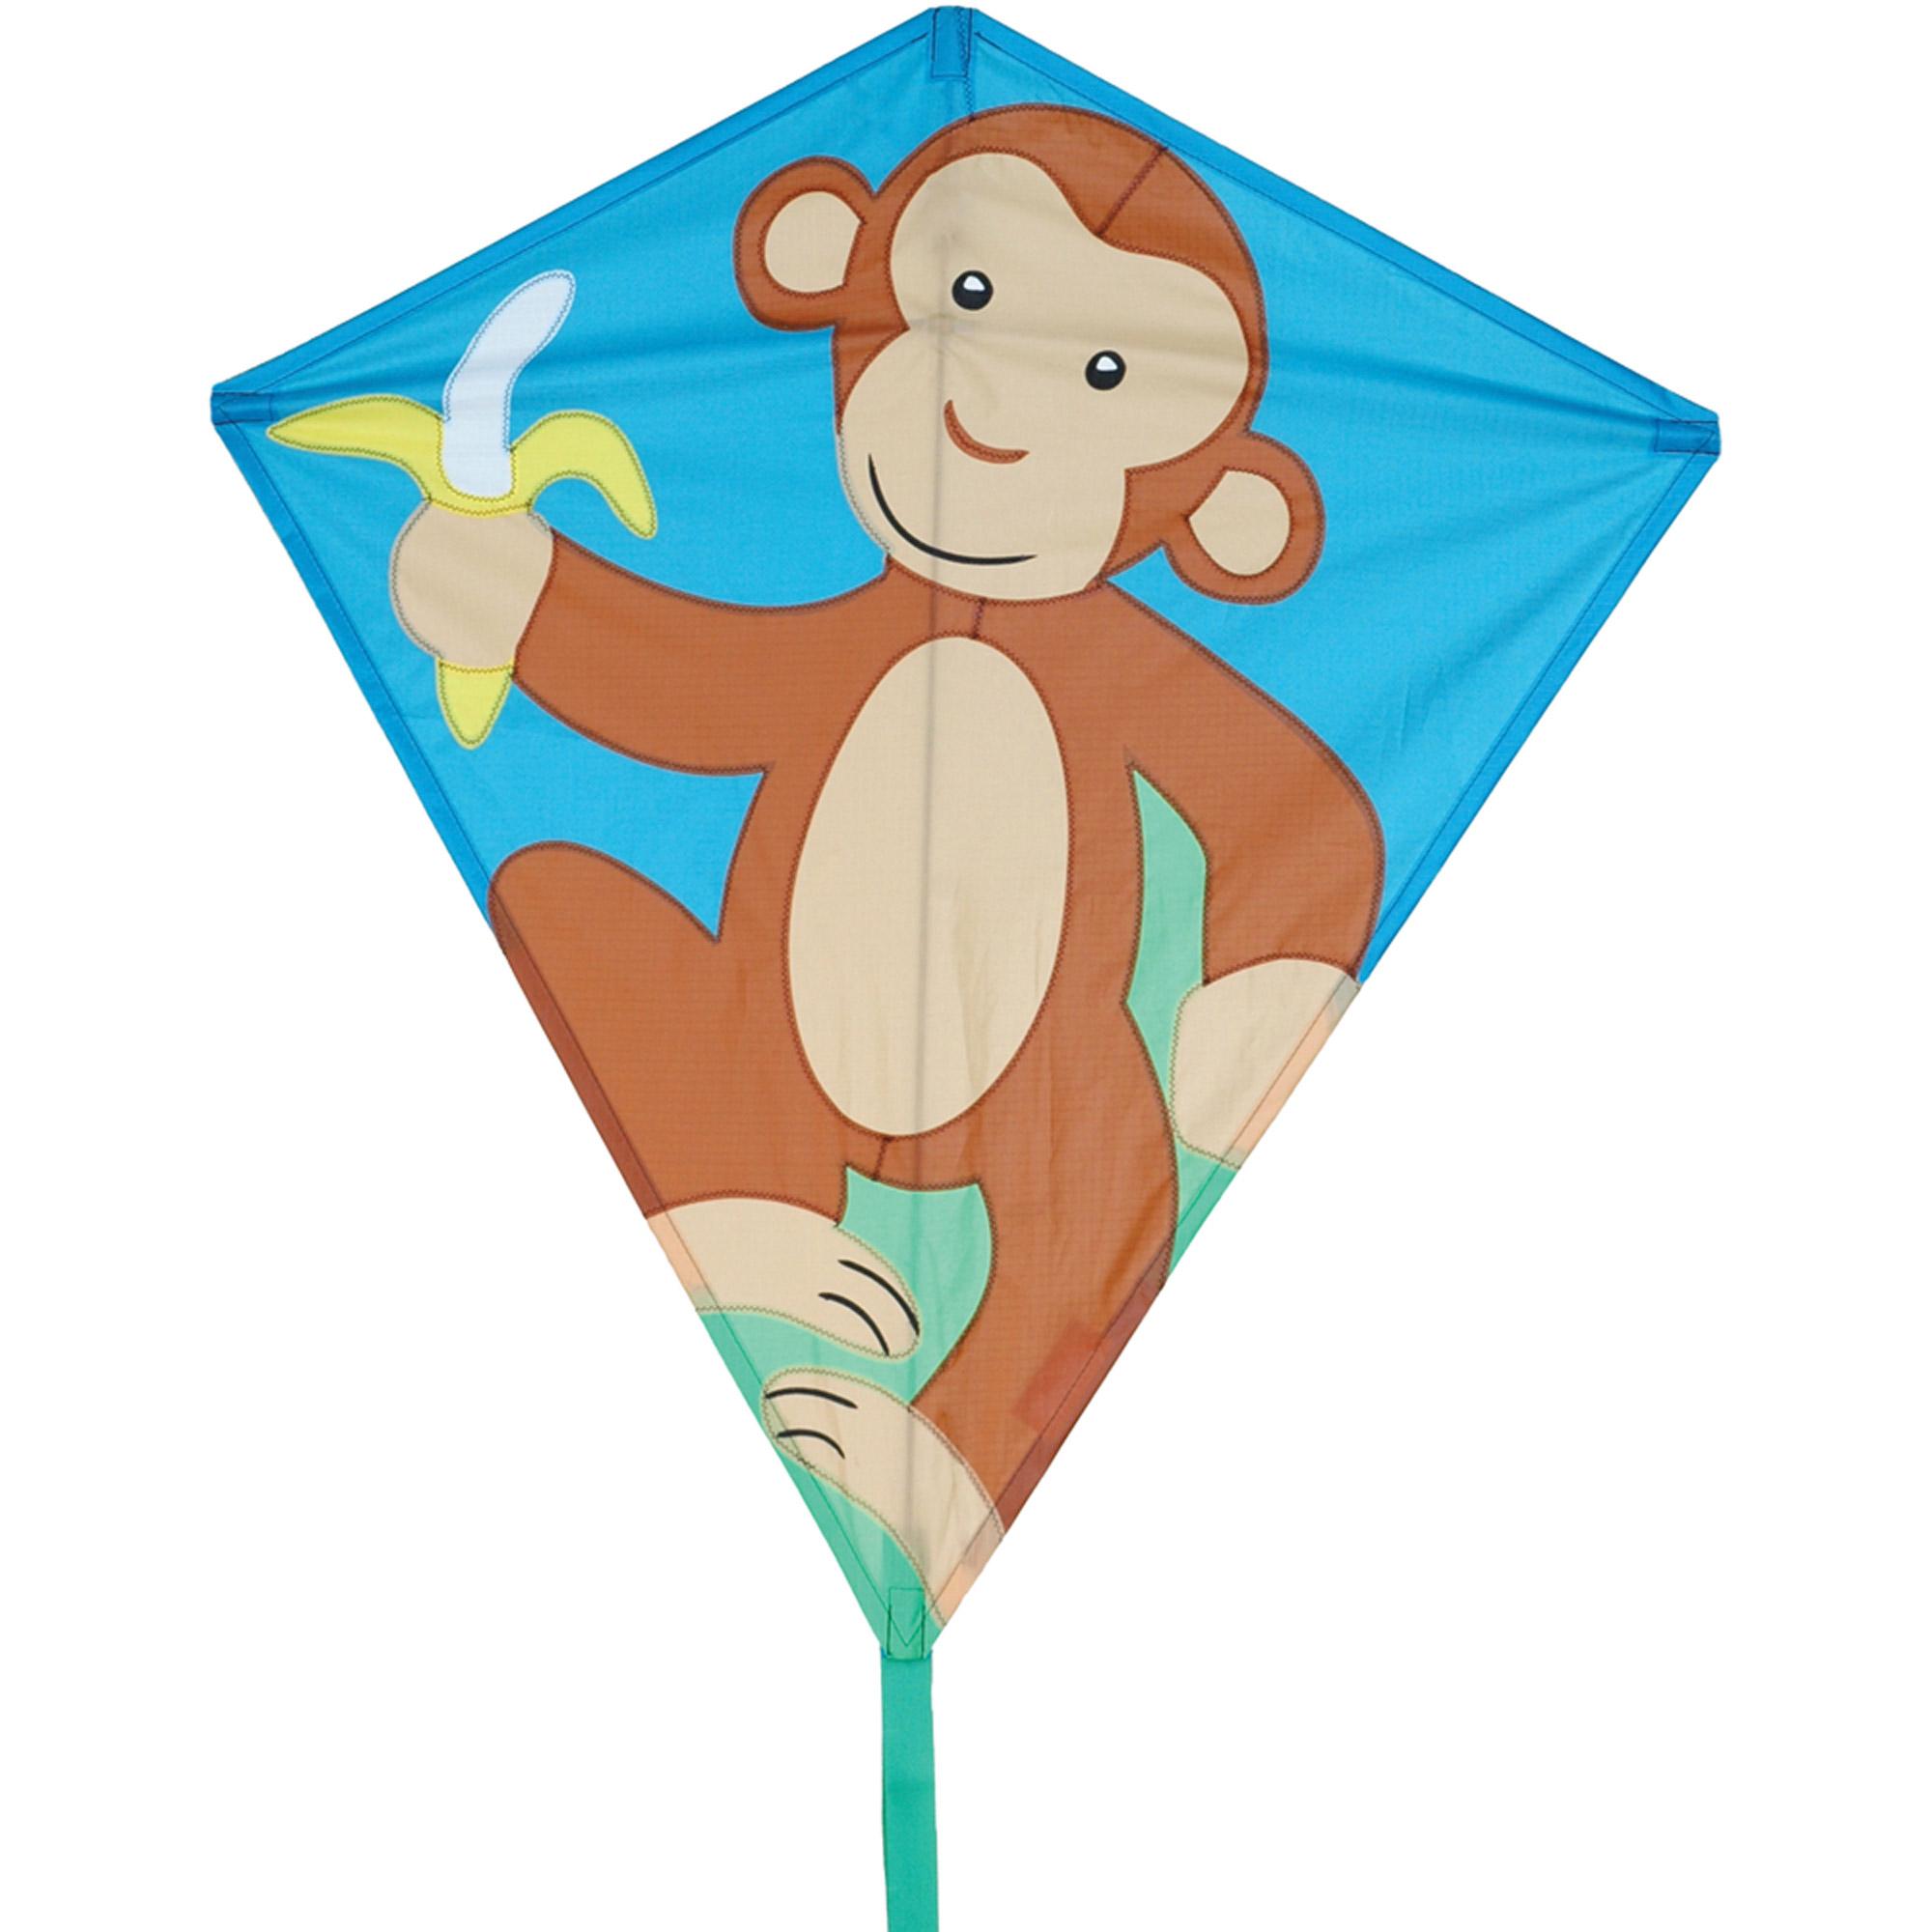 "Premier Designs 30"" Diamond Kite, Monkey"